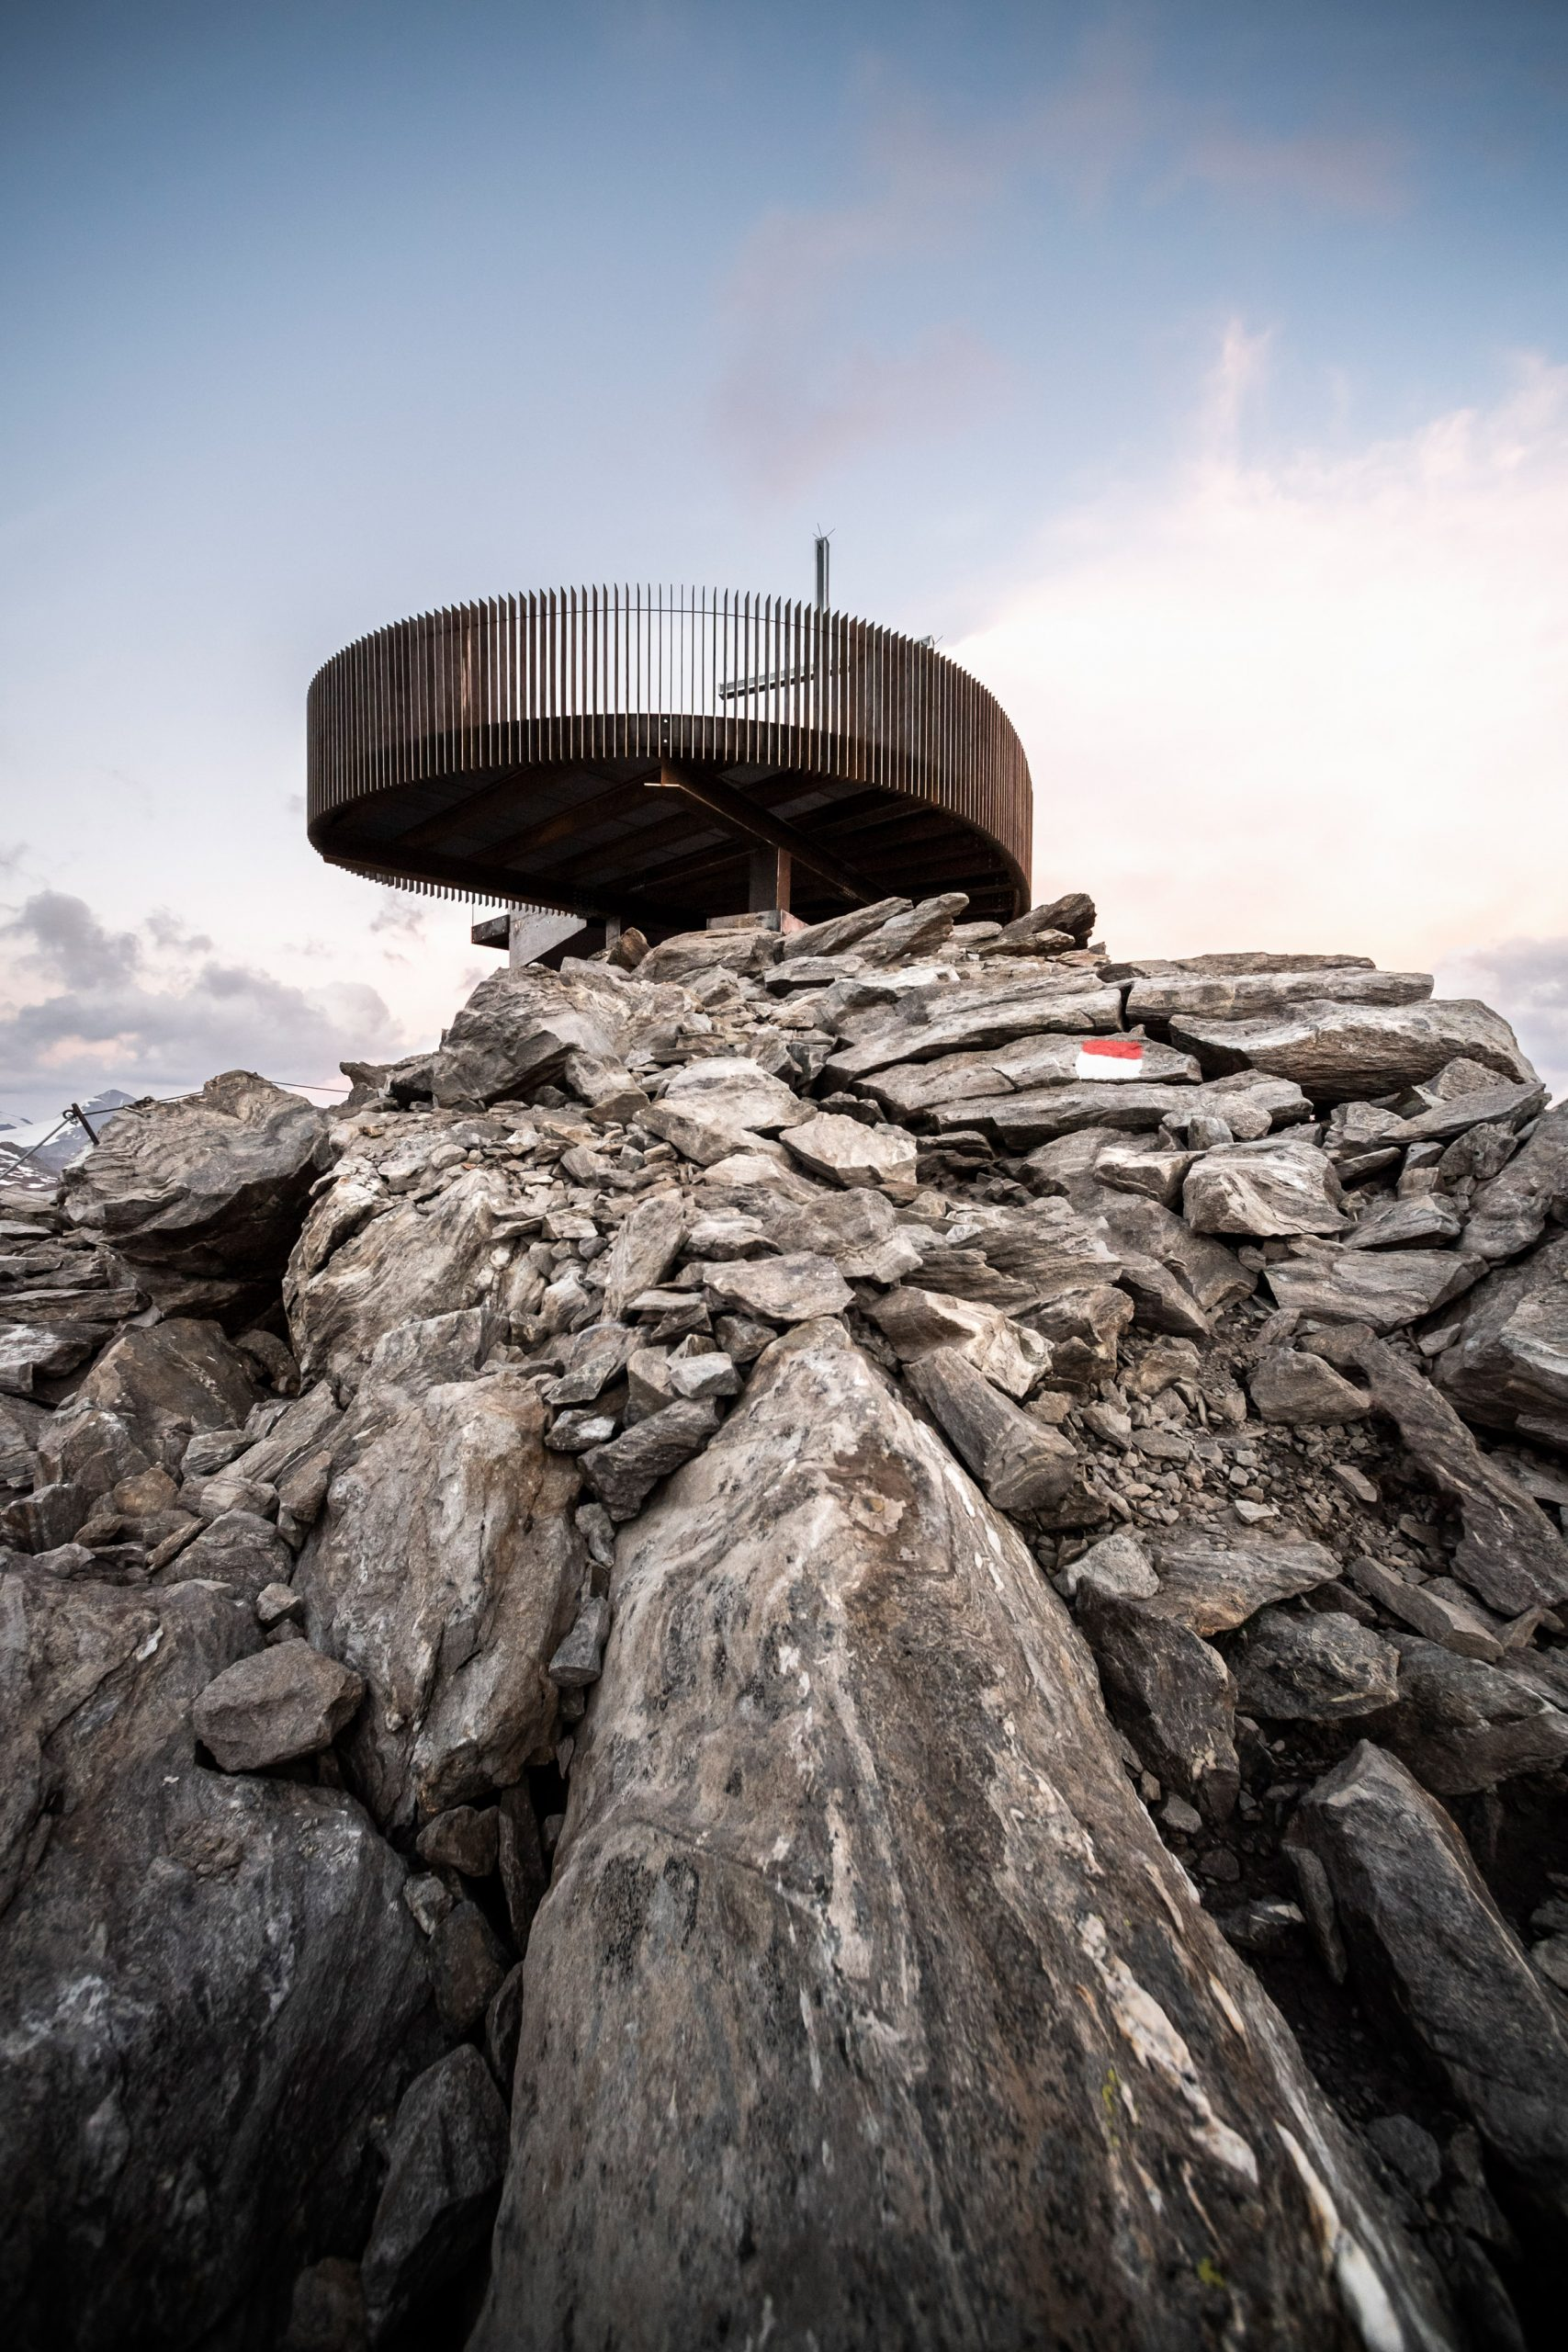 Otzi Peak 3251m is made from weathering steel